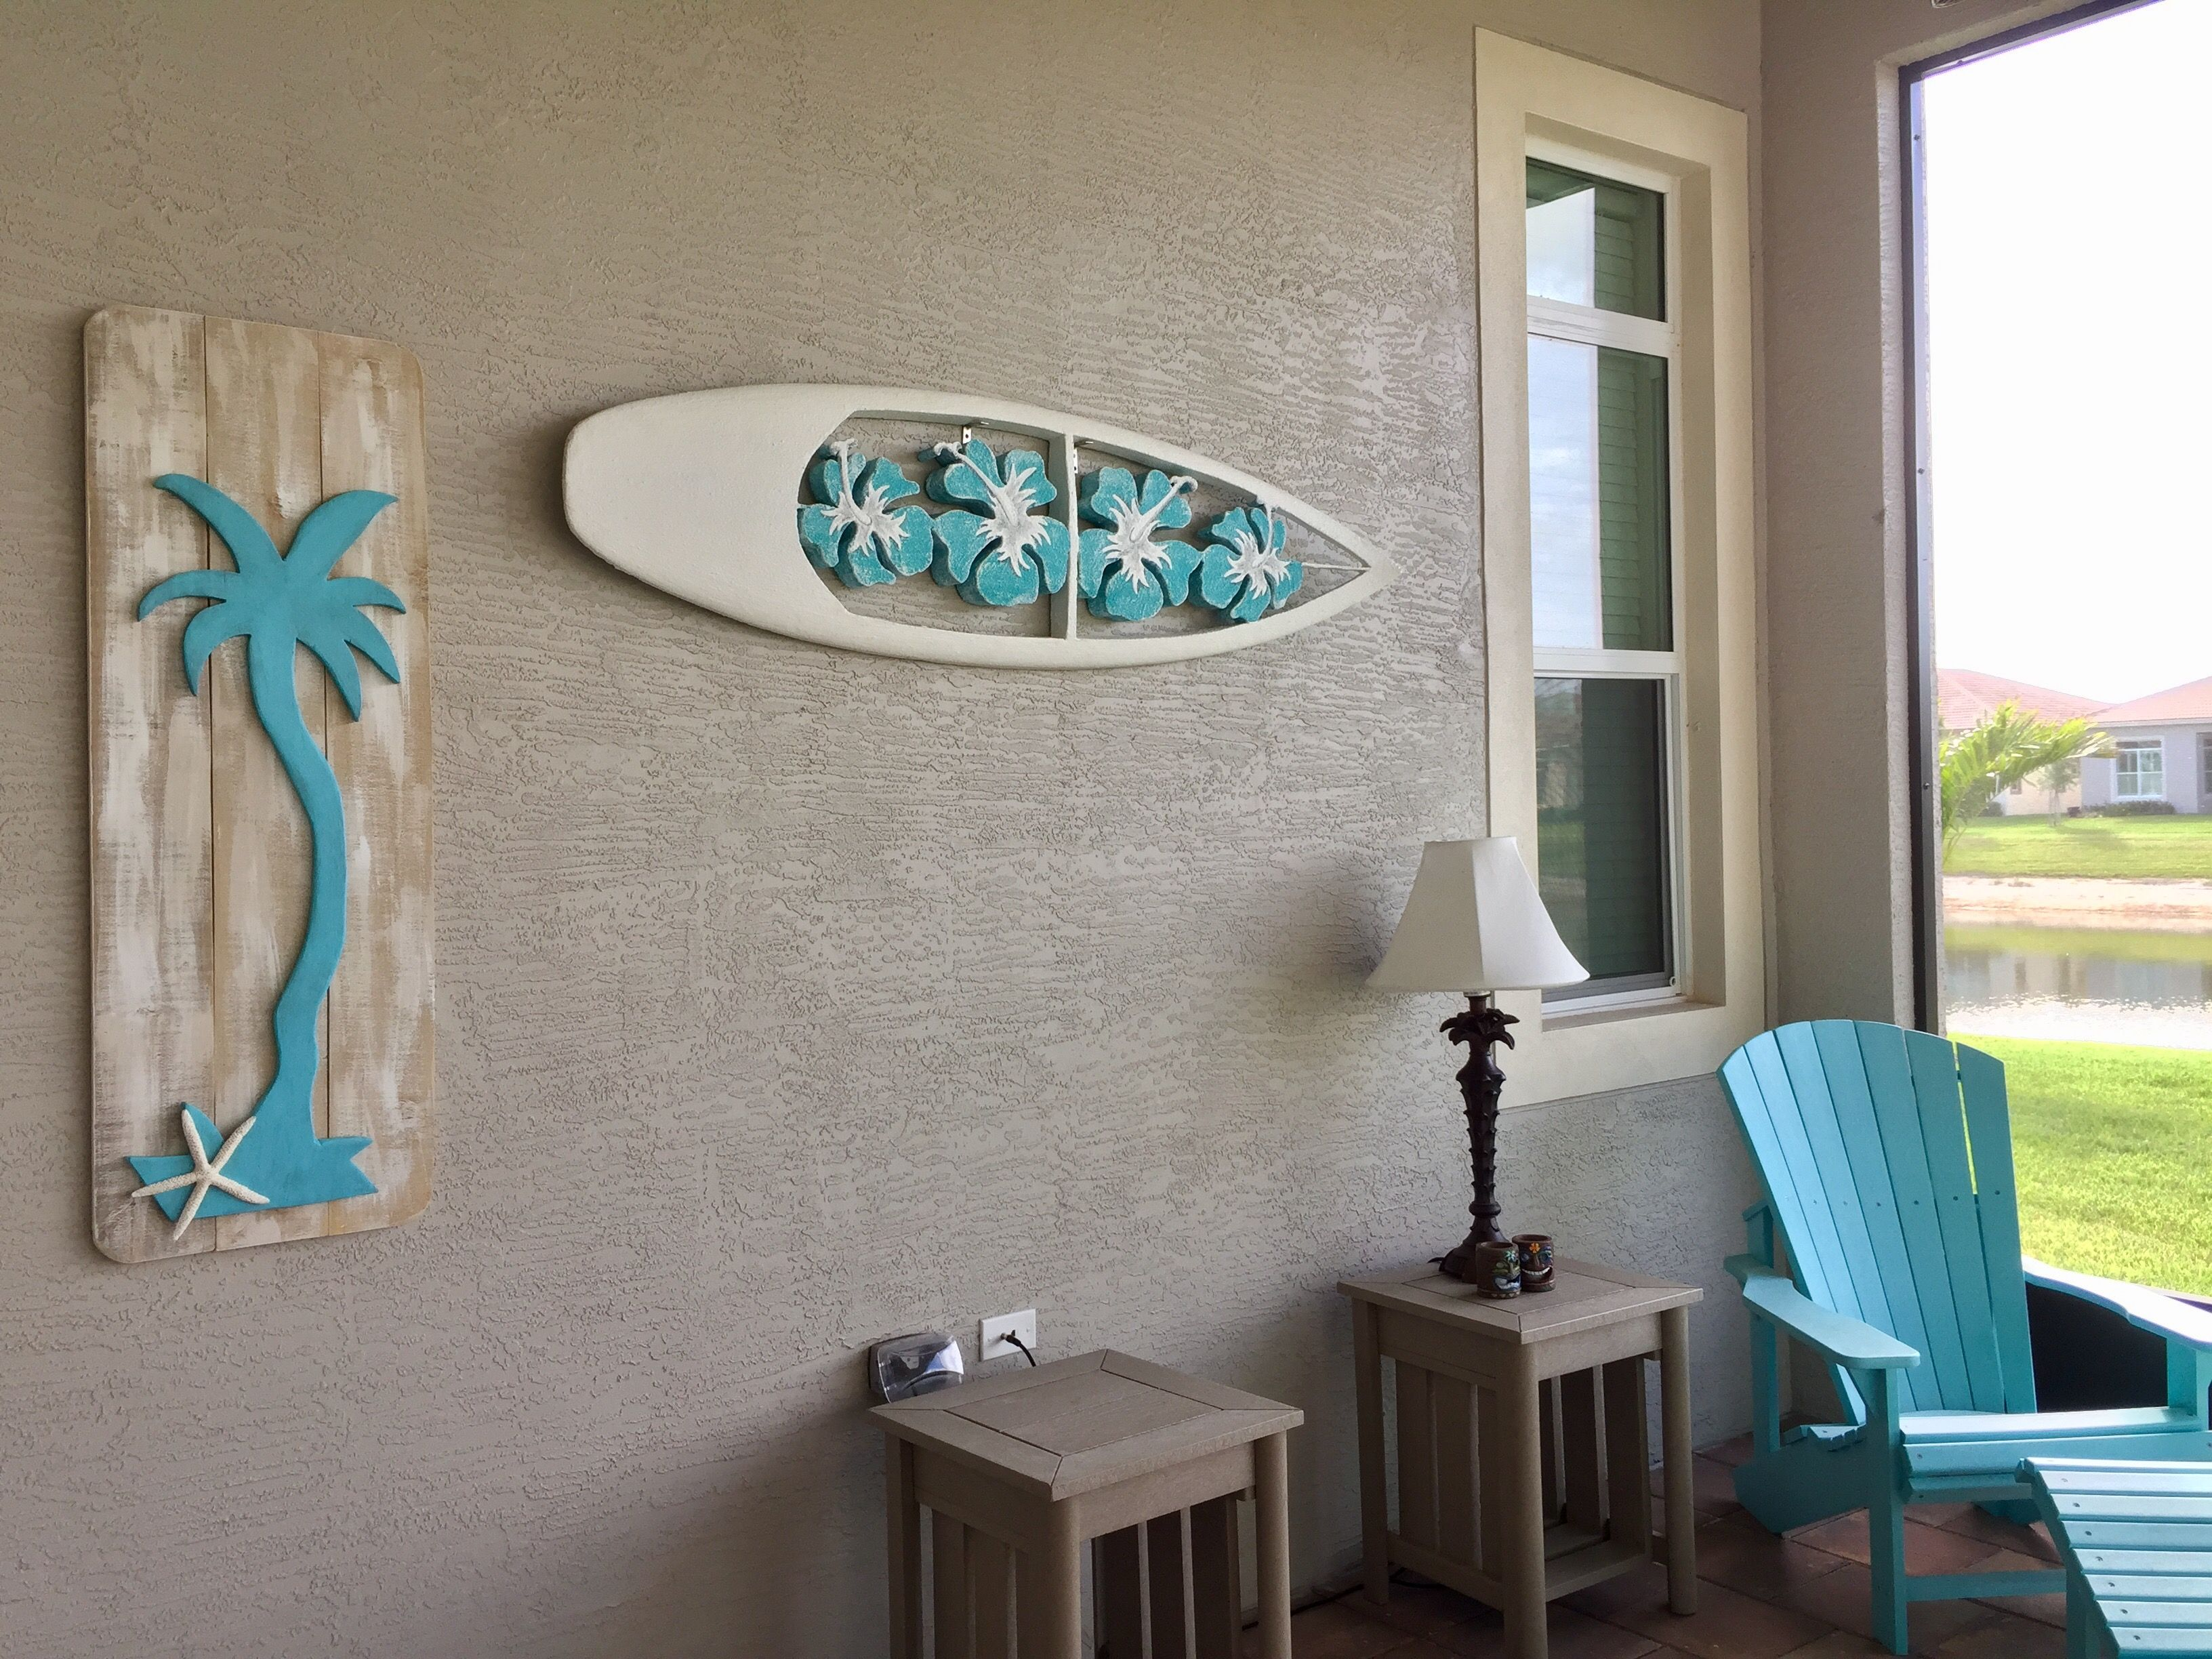 Decorating Our Lanai With Coastal Tropical Wall Art Lanai Decorating Beach Room Decor